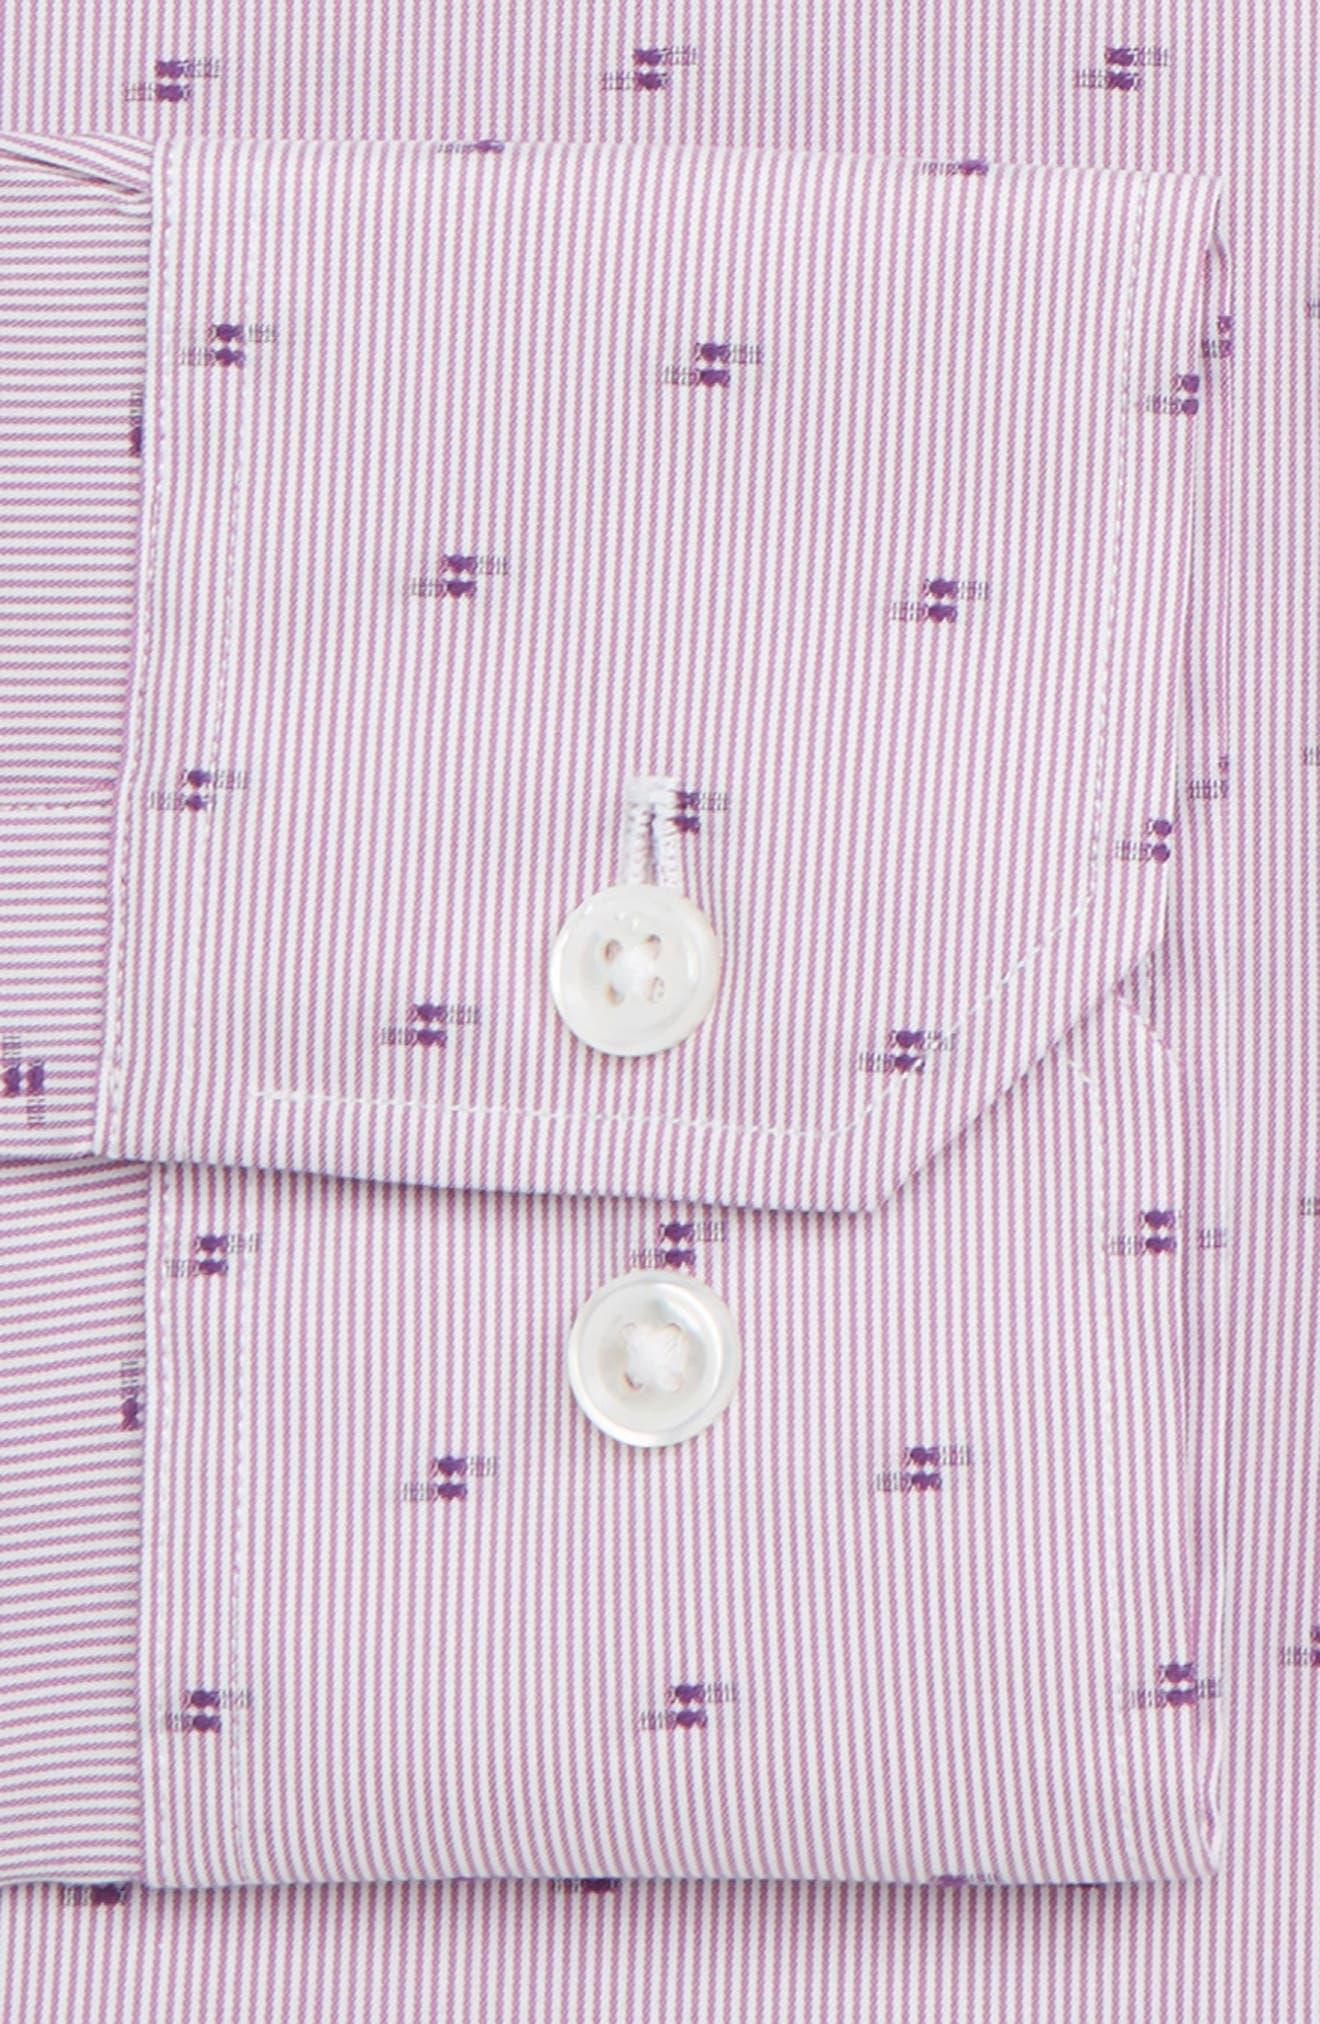 Elgine Filcoupe Slim Fit Stretch Stripe Dress Shirt,                             Alternate thumbnail 2, color,                             PINK